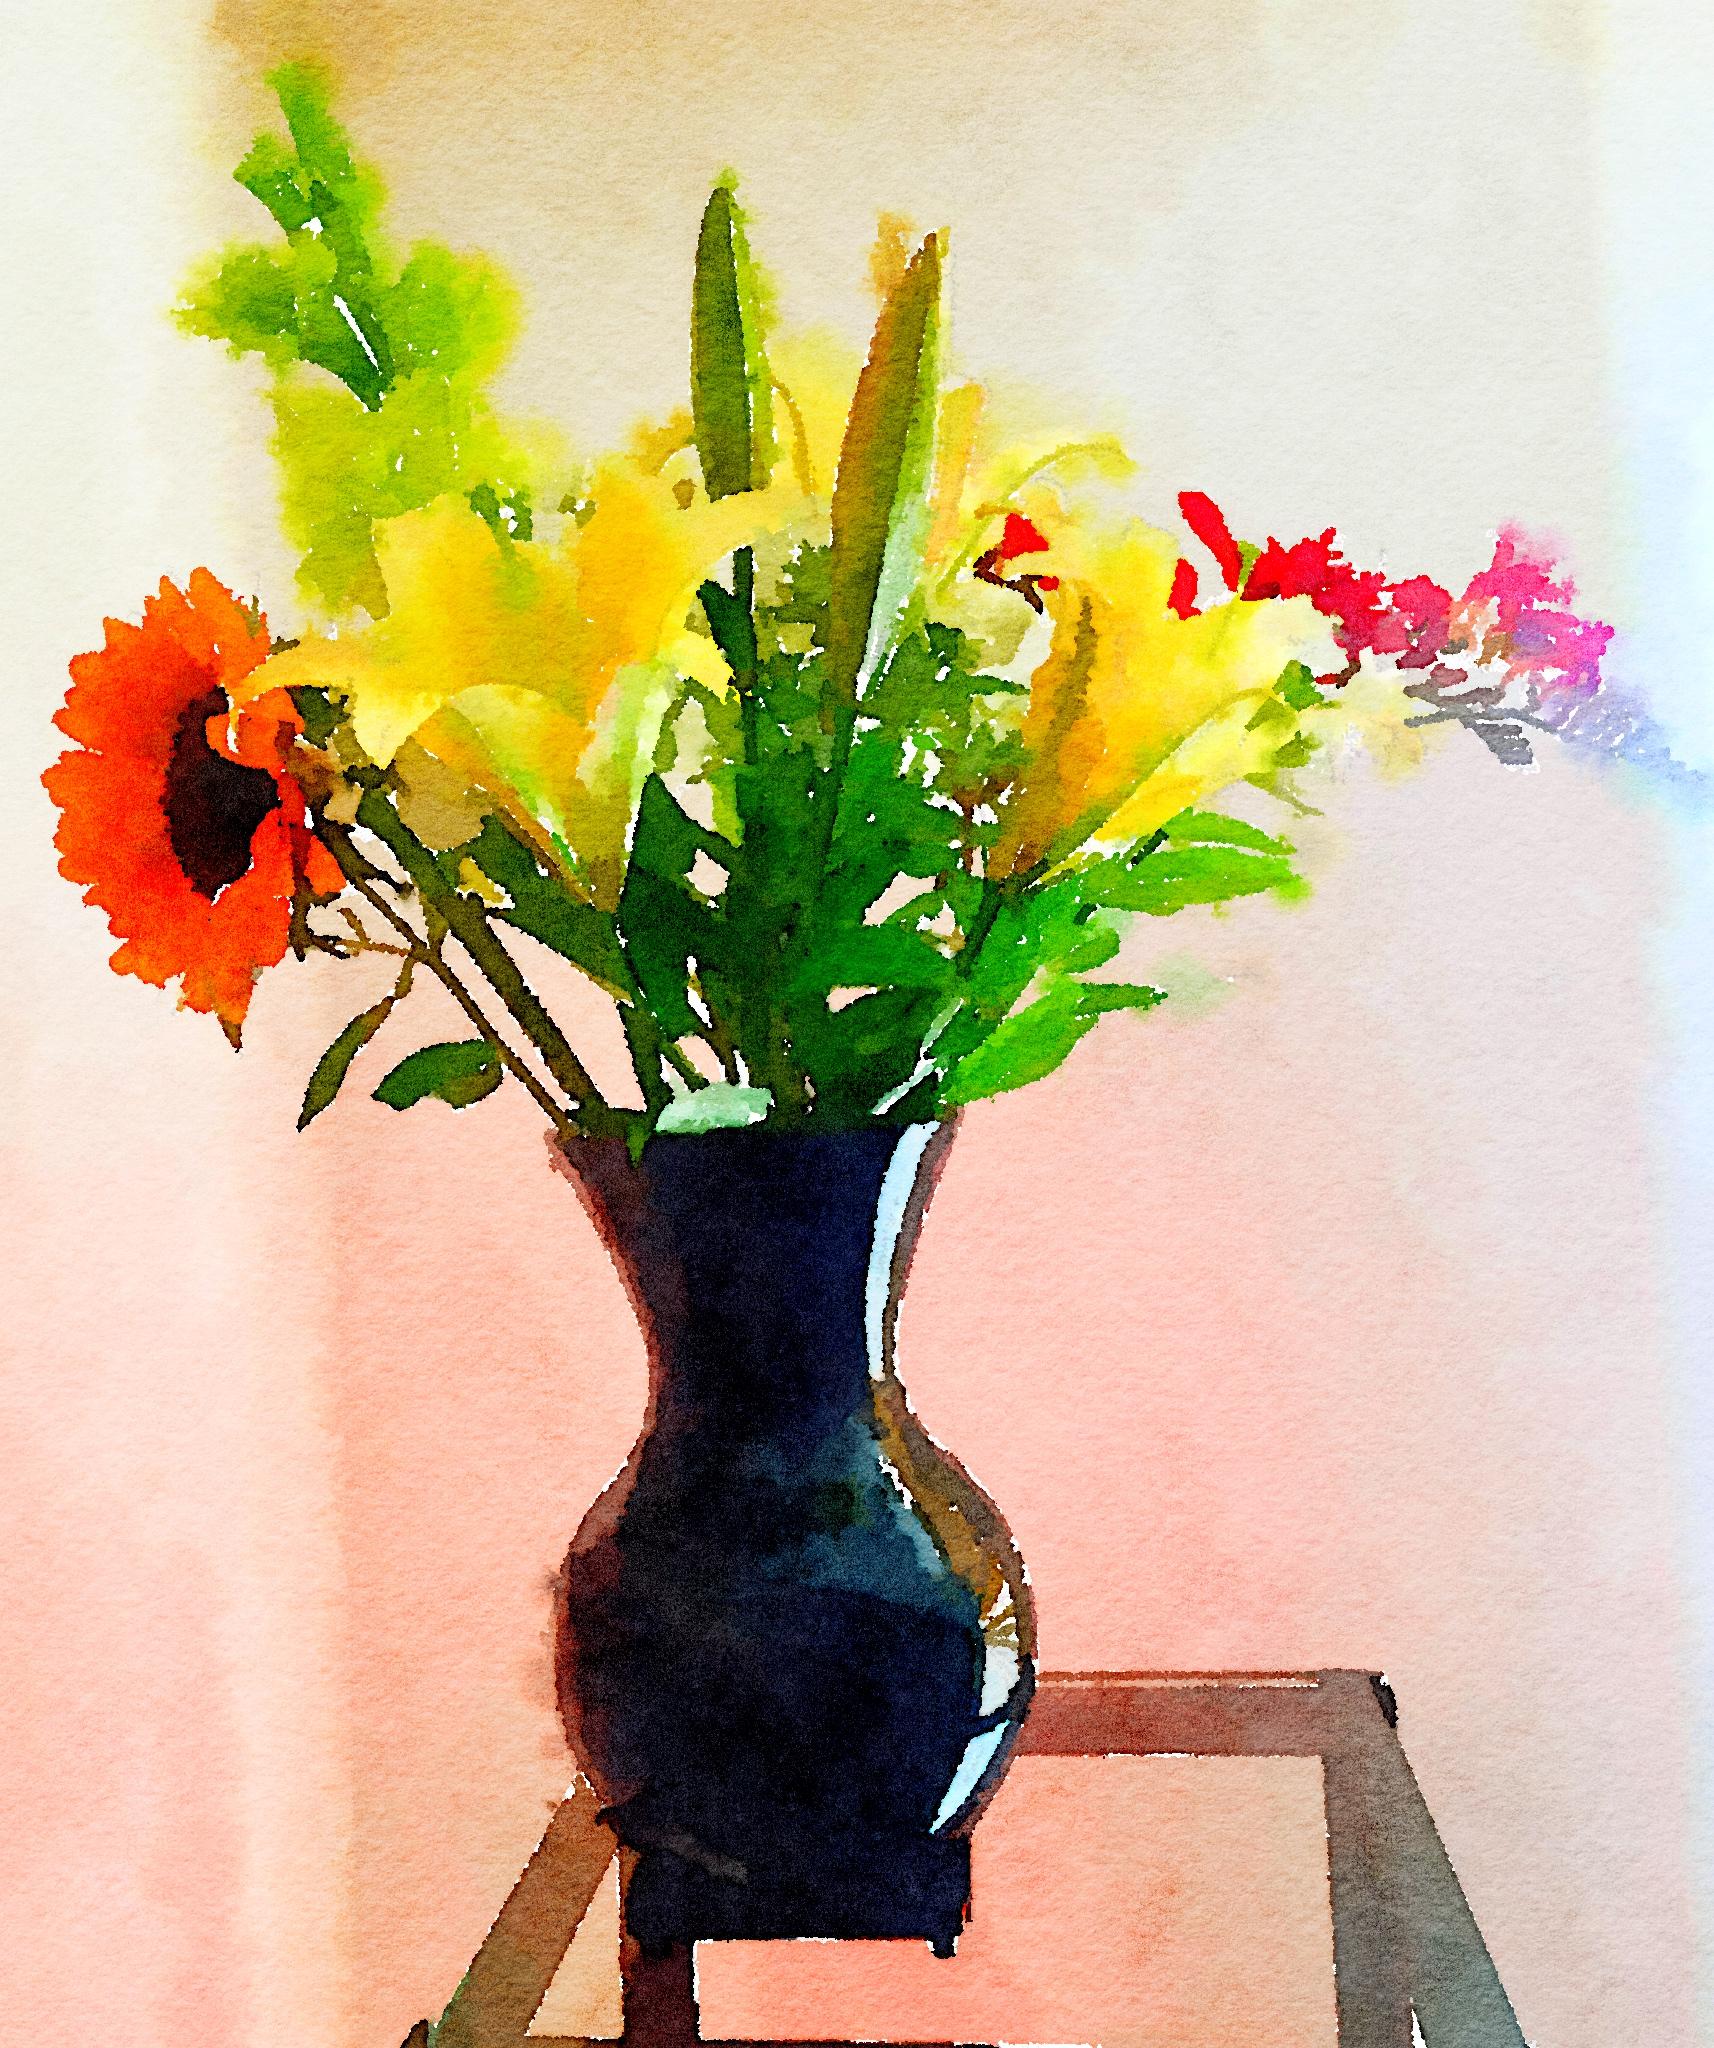 Week Twenty-Five: Yellow Lilies, Gladiola, Sunflower, and Kangaroo Paw in Glossy Black Vase